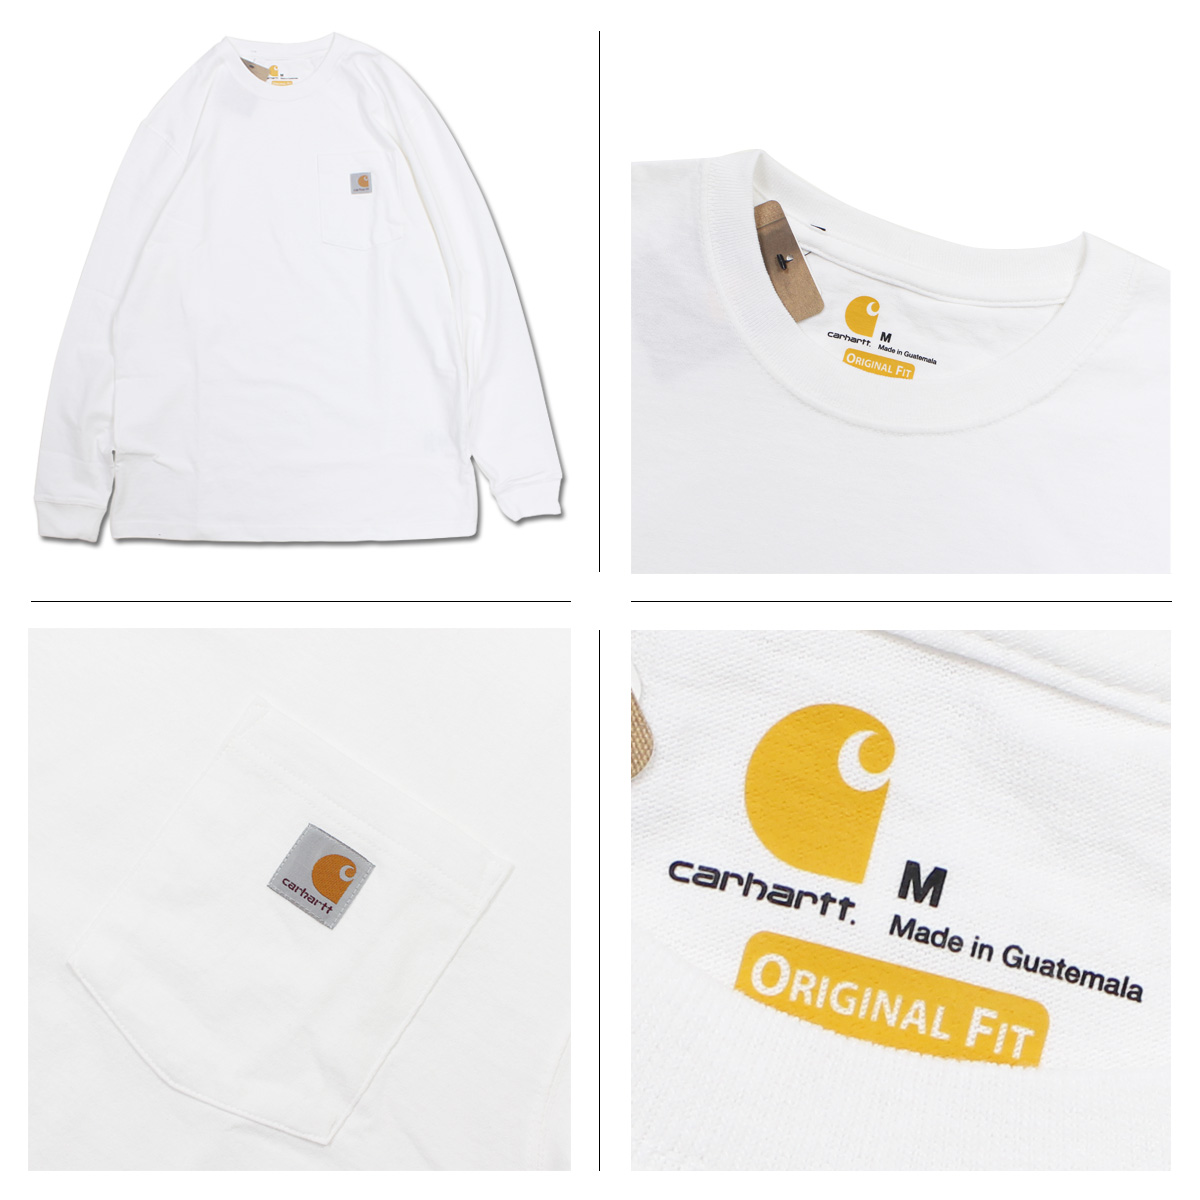 9ebd120bfd8 carhartt WORKER POCKET LS T-SHIRTS car heart T-shirt men long sleeves Ron T  K126  3 9 Shinnyu load   183